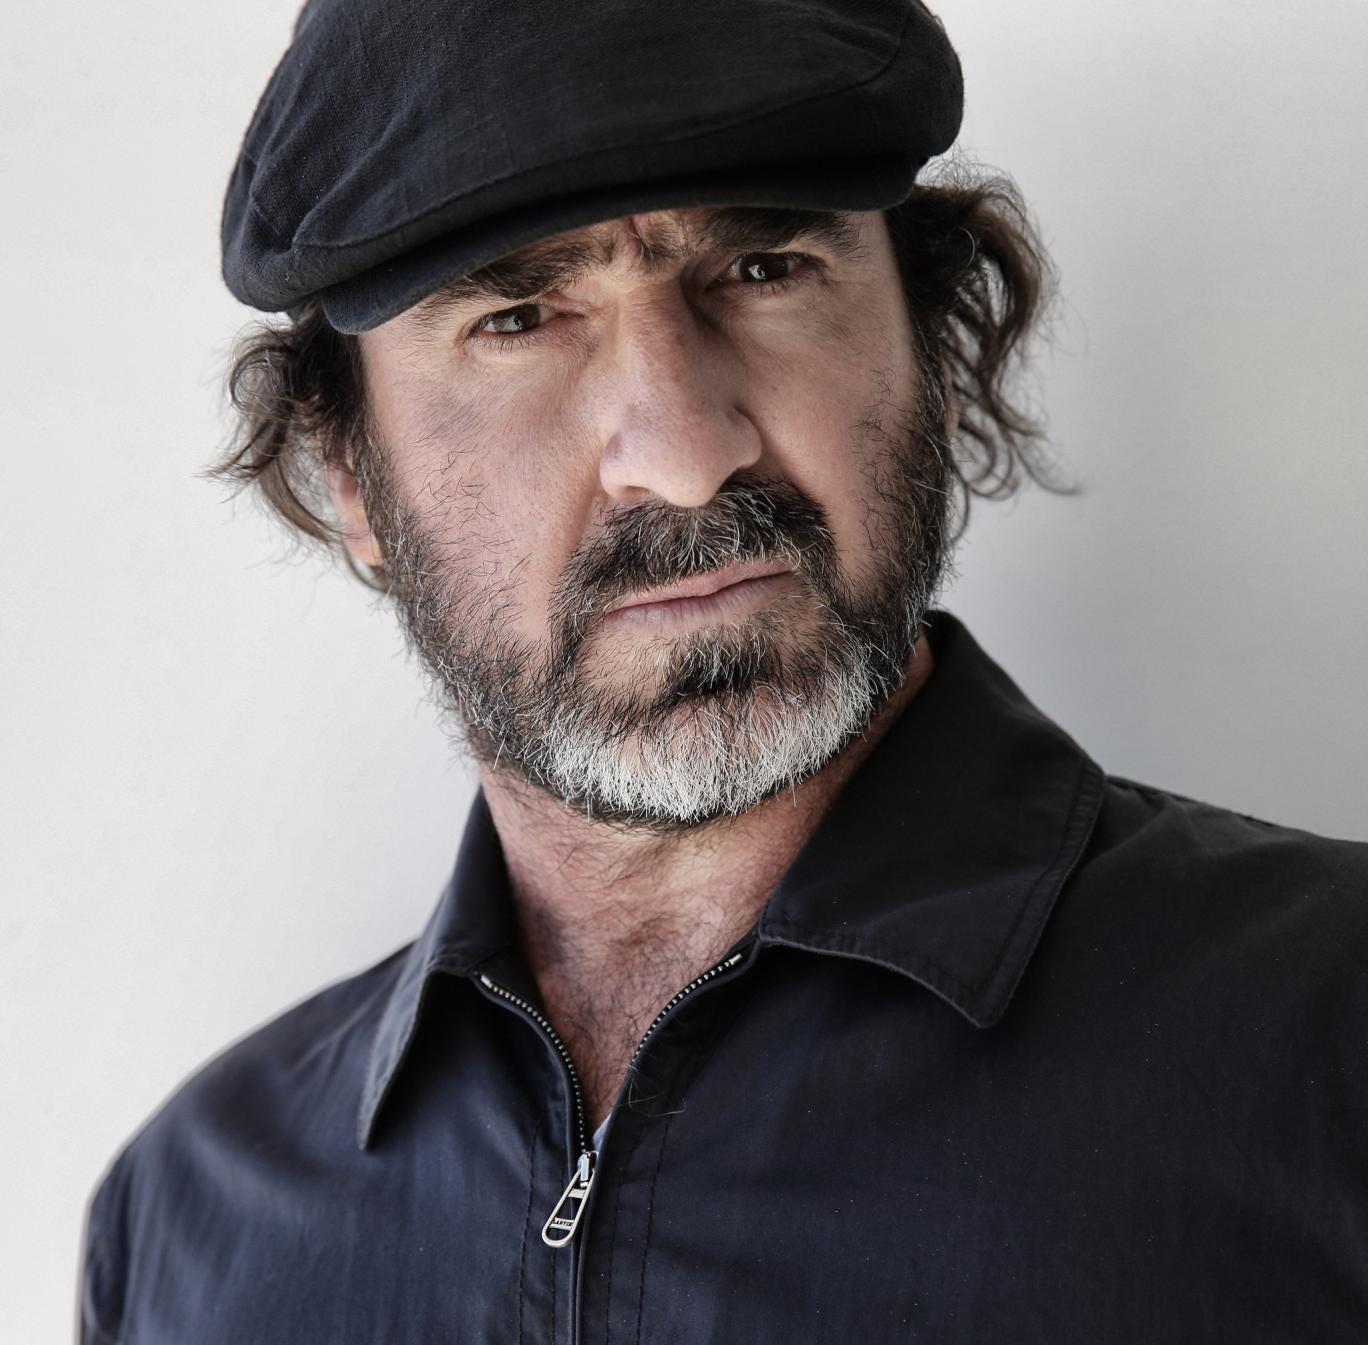 Eric Cantona posing at the Cannes Film Festival 2013